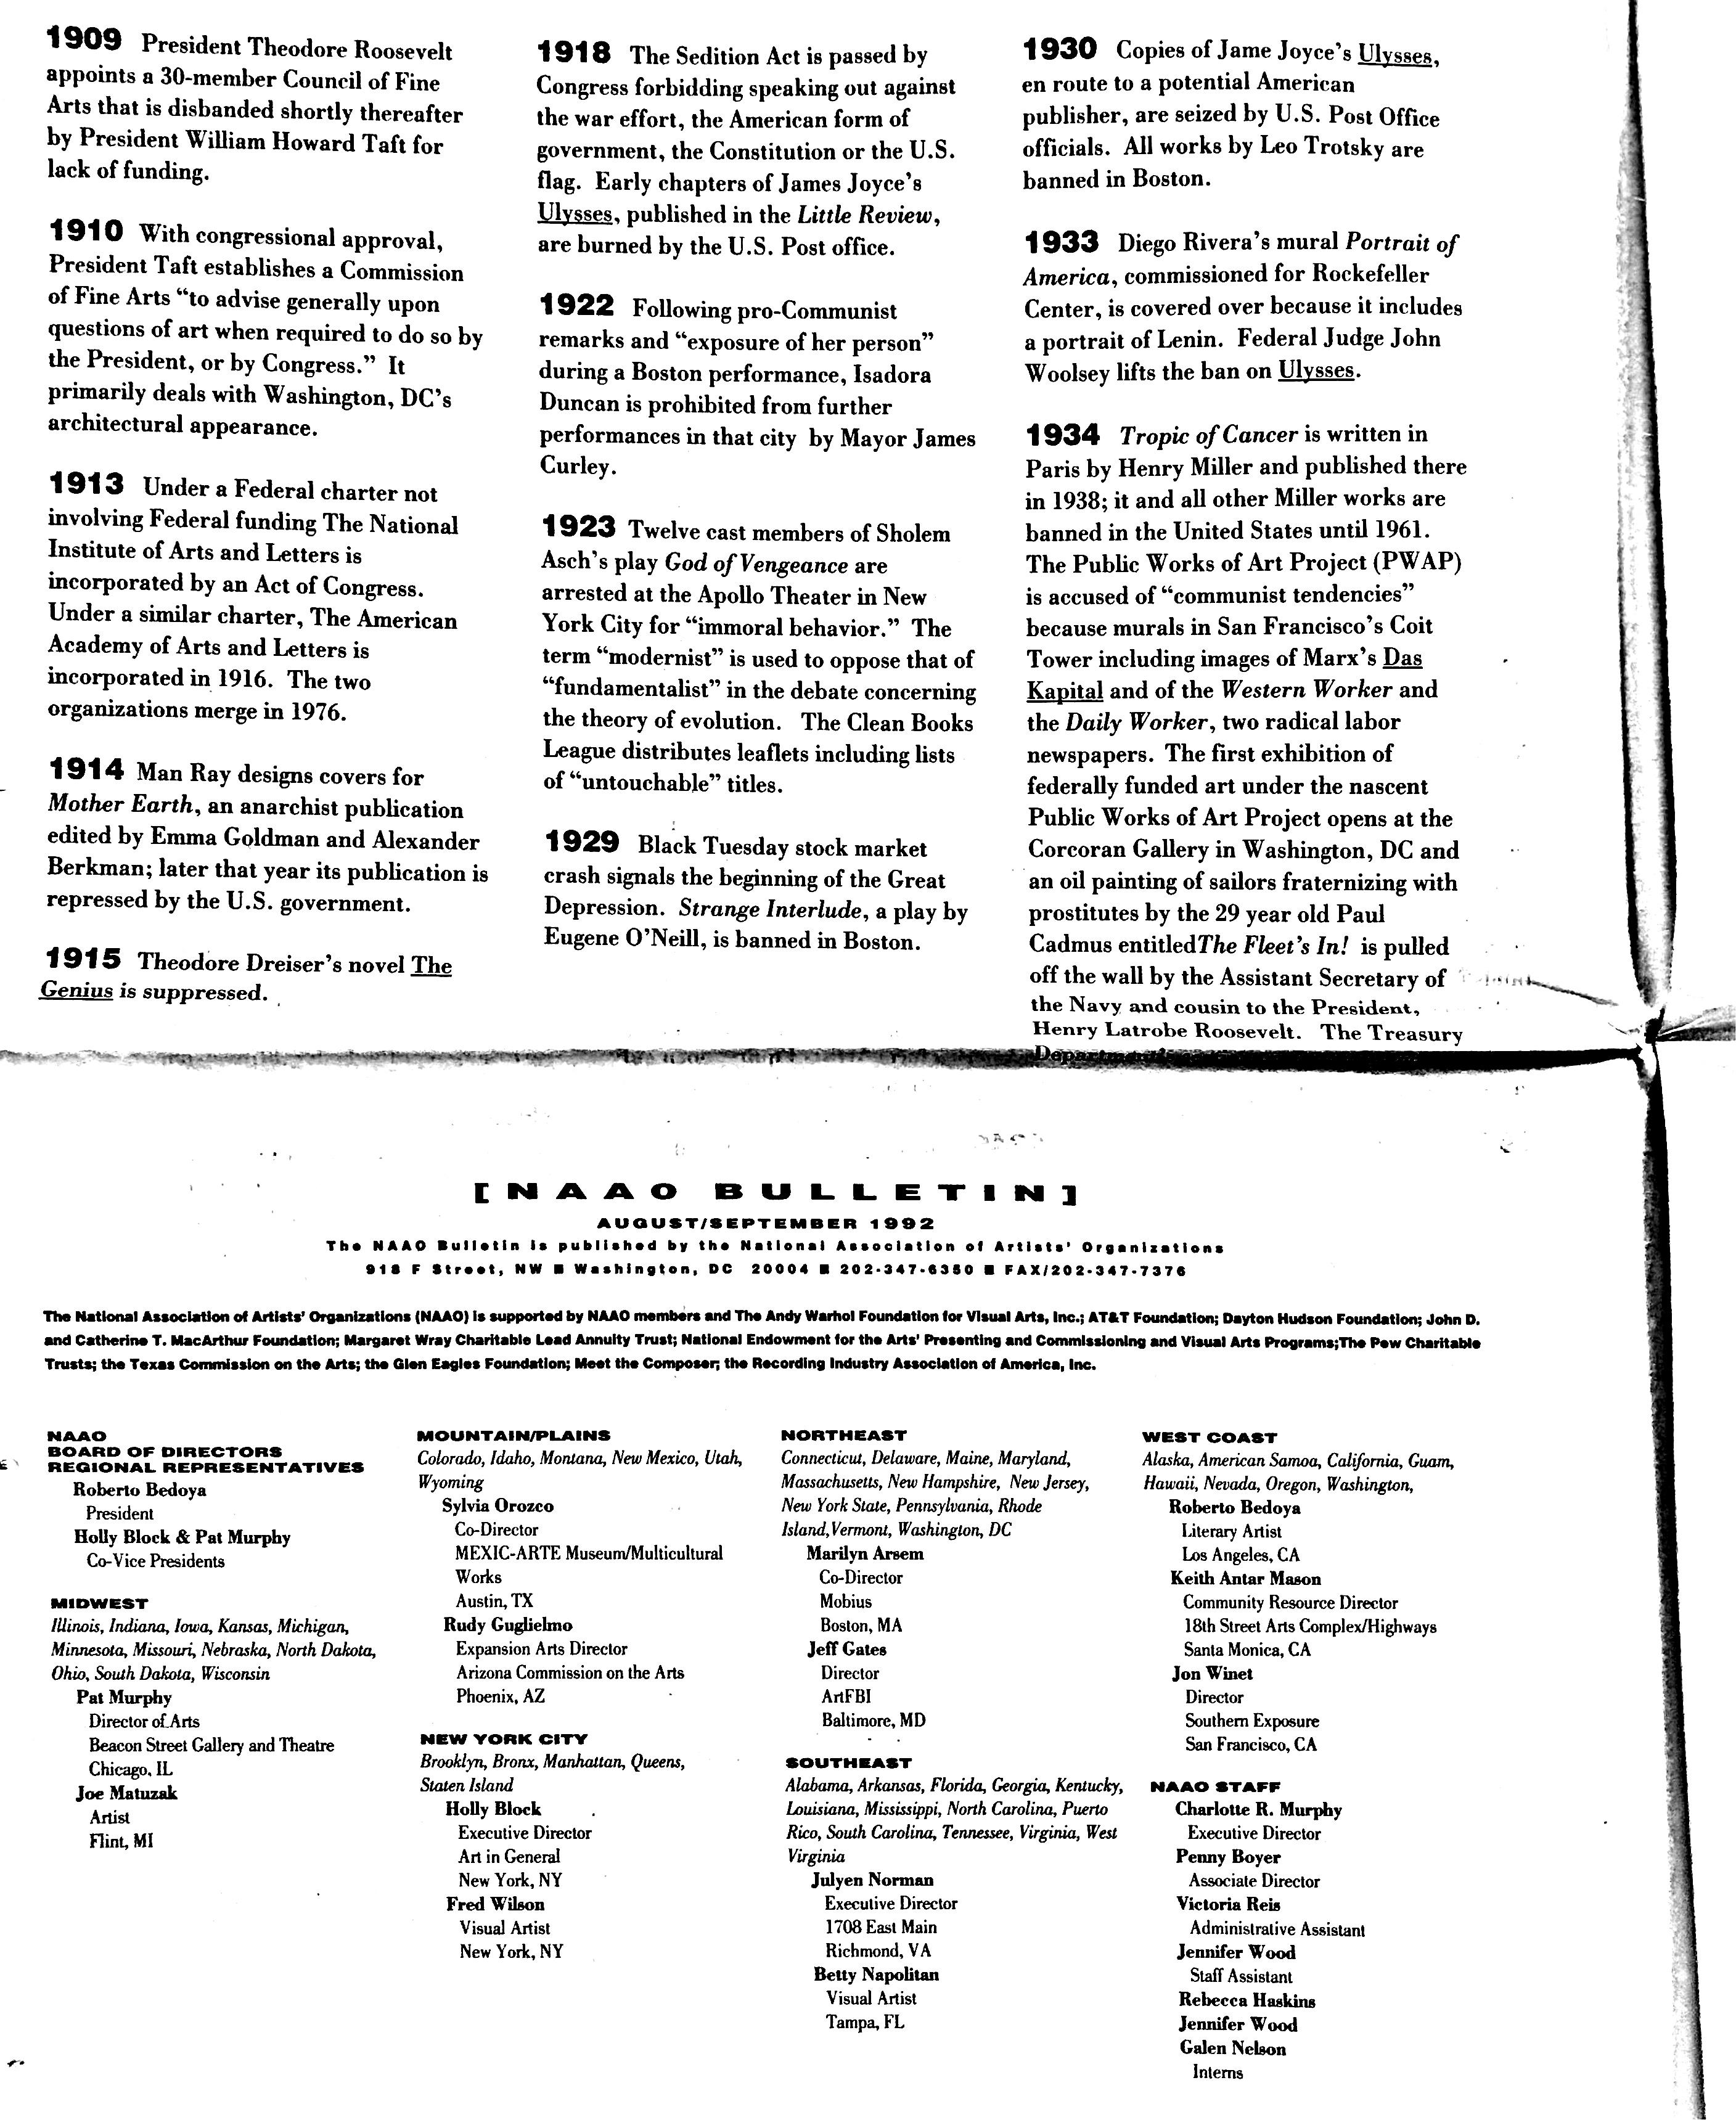 August-September 1992 - NAAO Bulletin Page 2.jpg